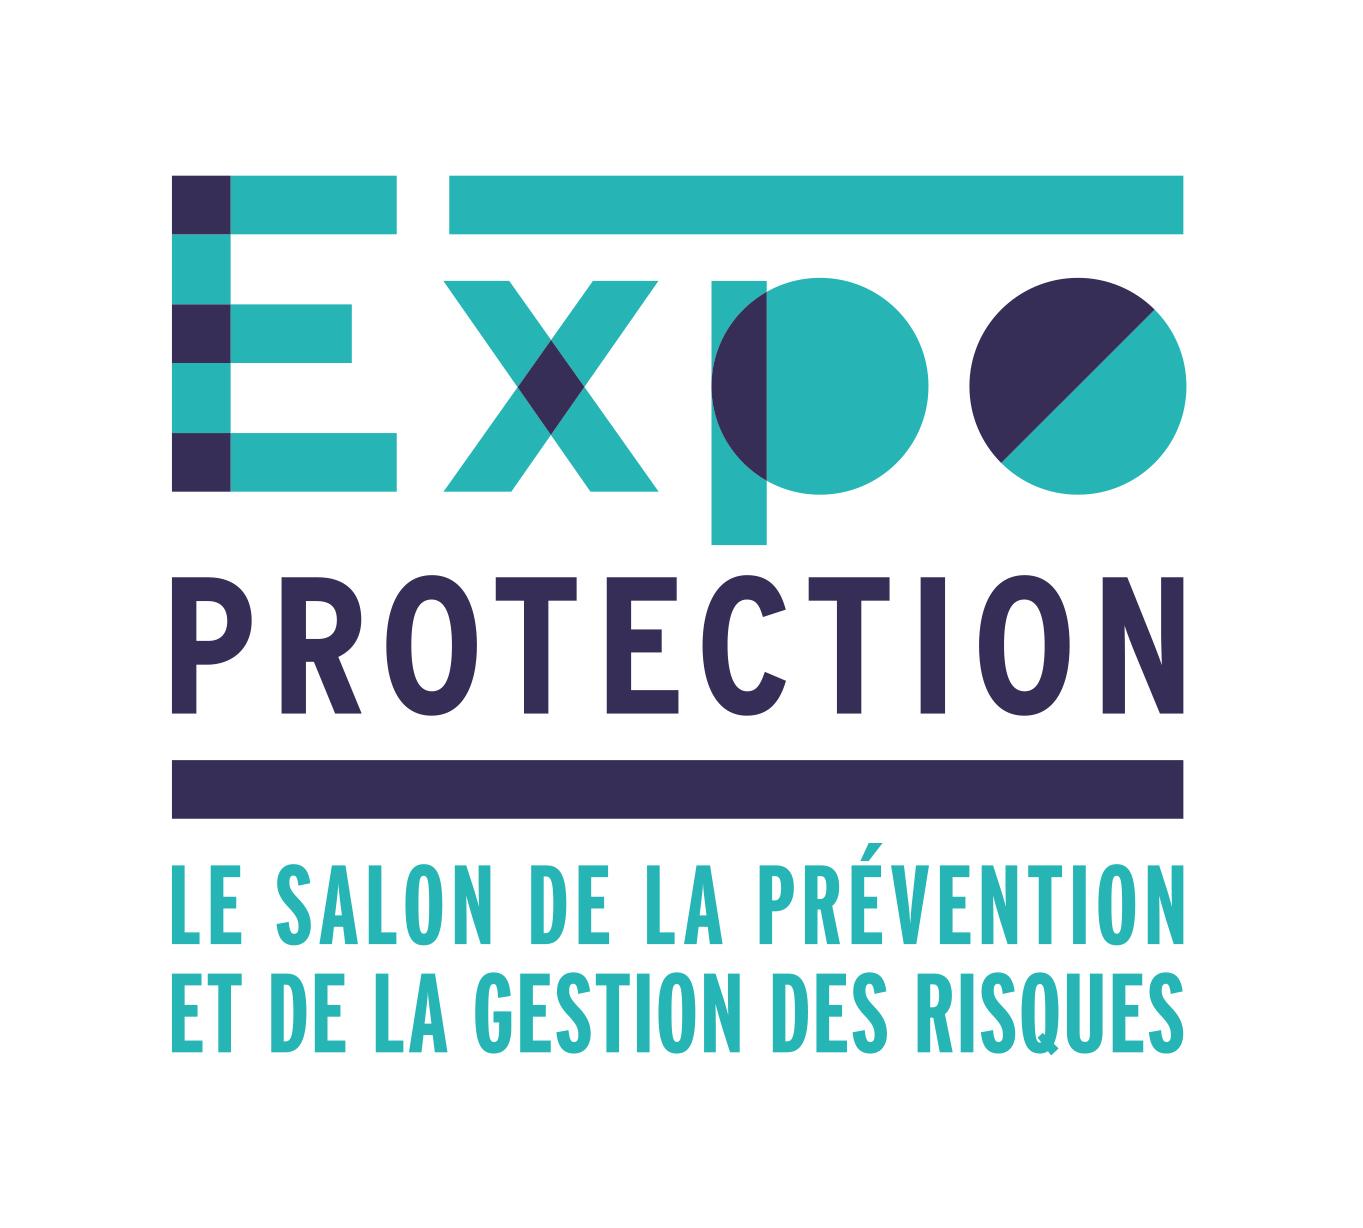 EXPOPROTECTION- PARIS 6-8 NOVEMBER 2018